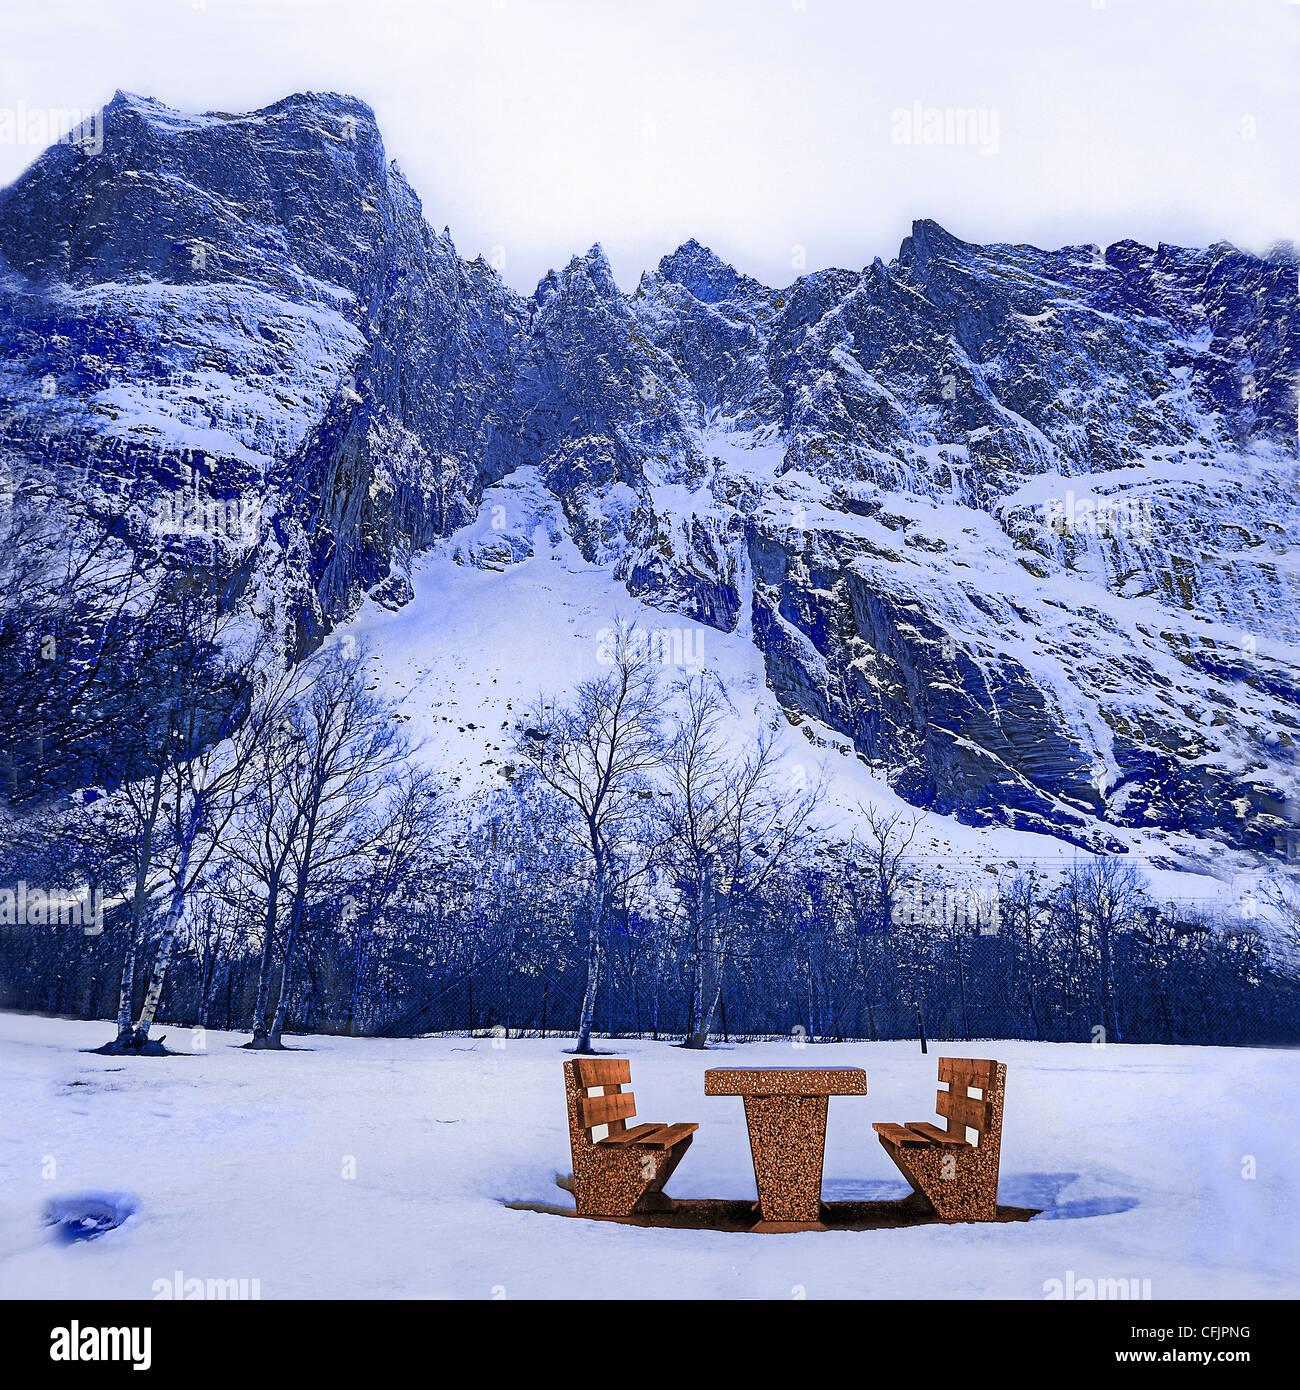 Road-side resting place under the Trolltindane peaks, Romsdalen, Norway - Stock Image